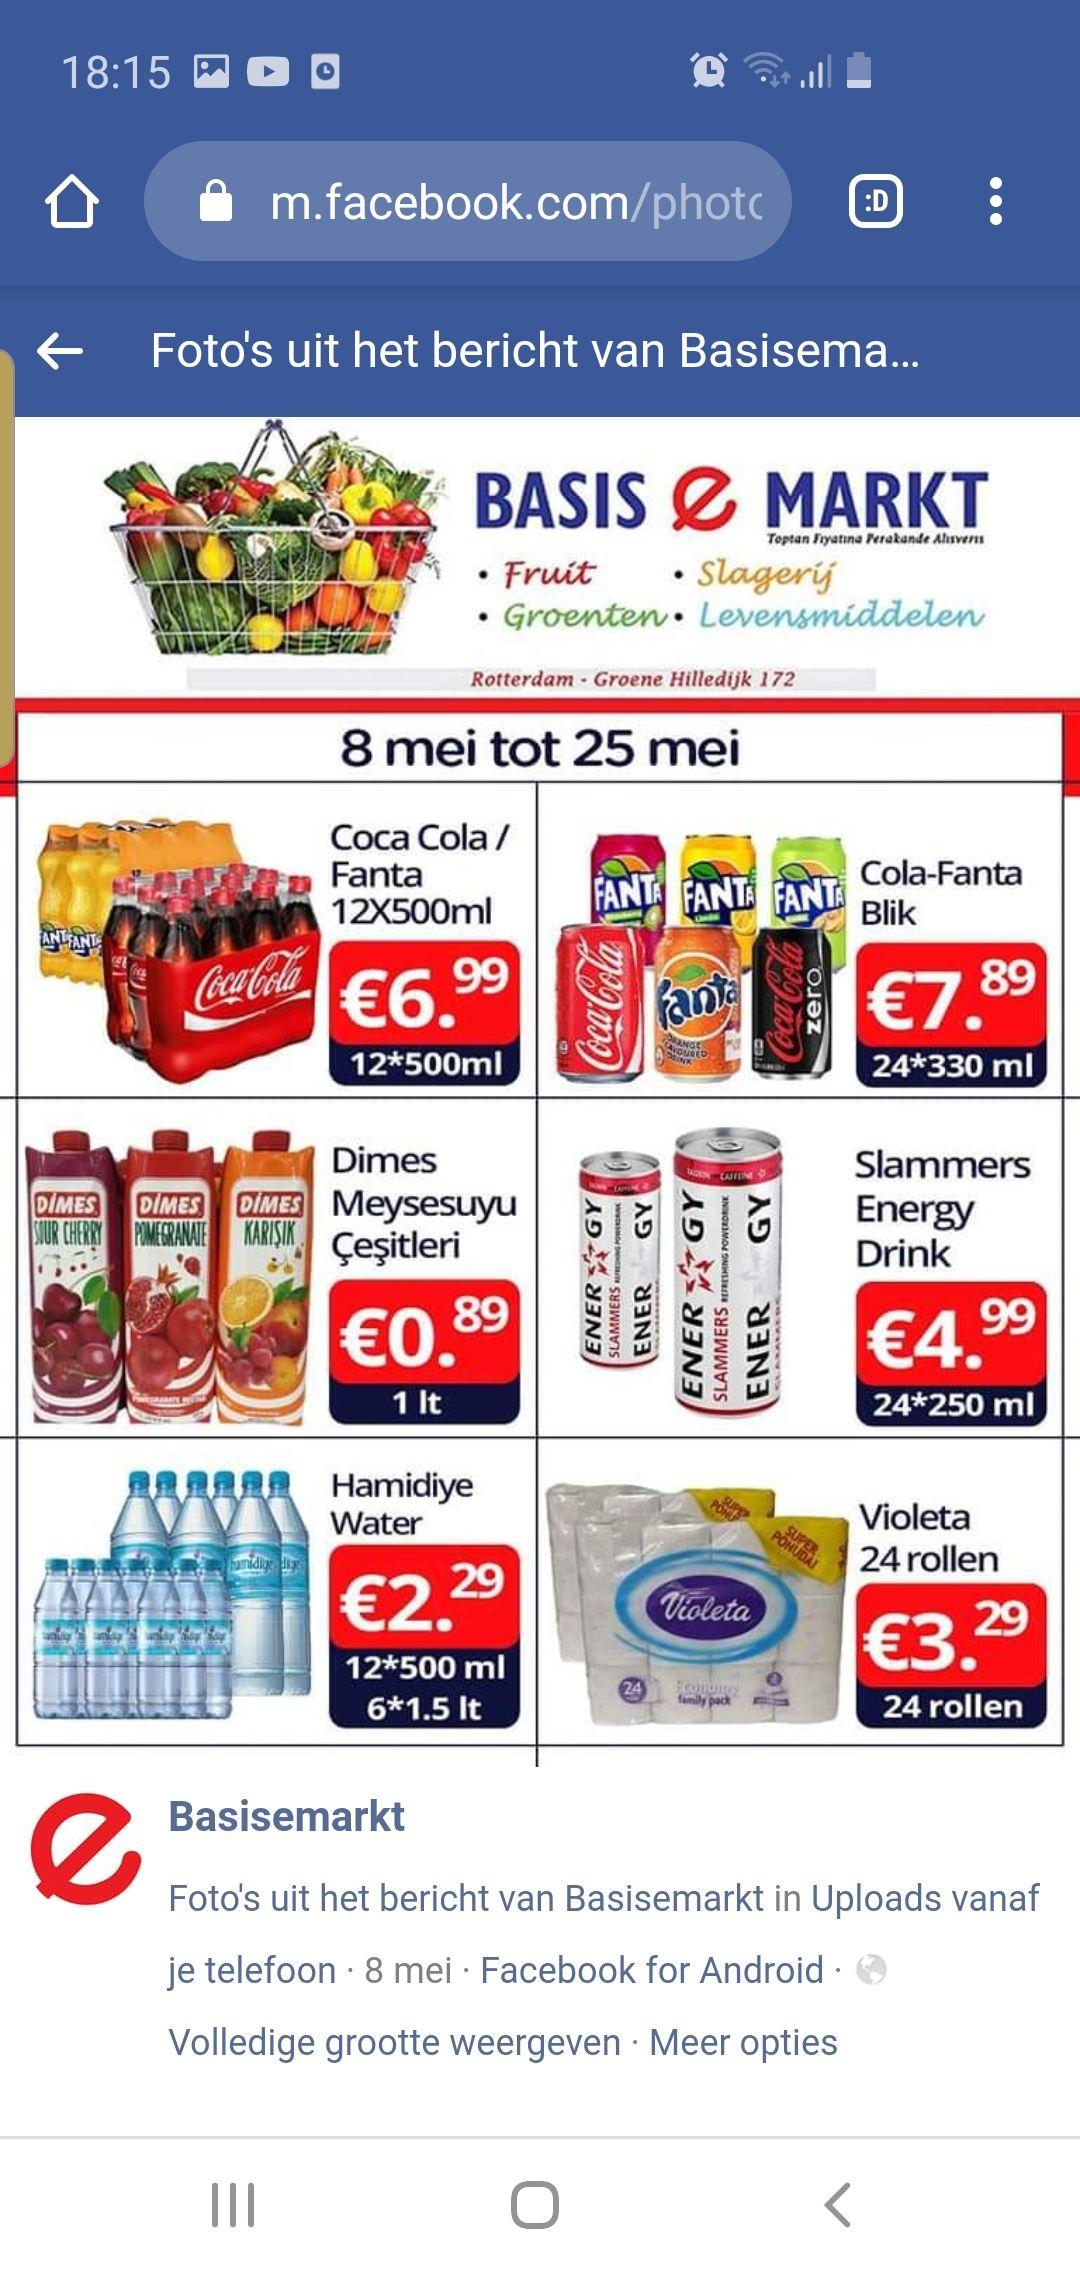 Fanta cola alle smaken 7.89 24*330 ml @Basis E Markt Rotterdam